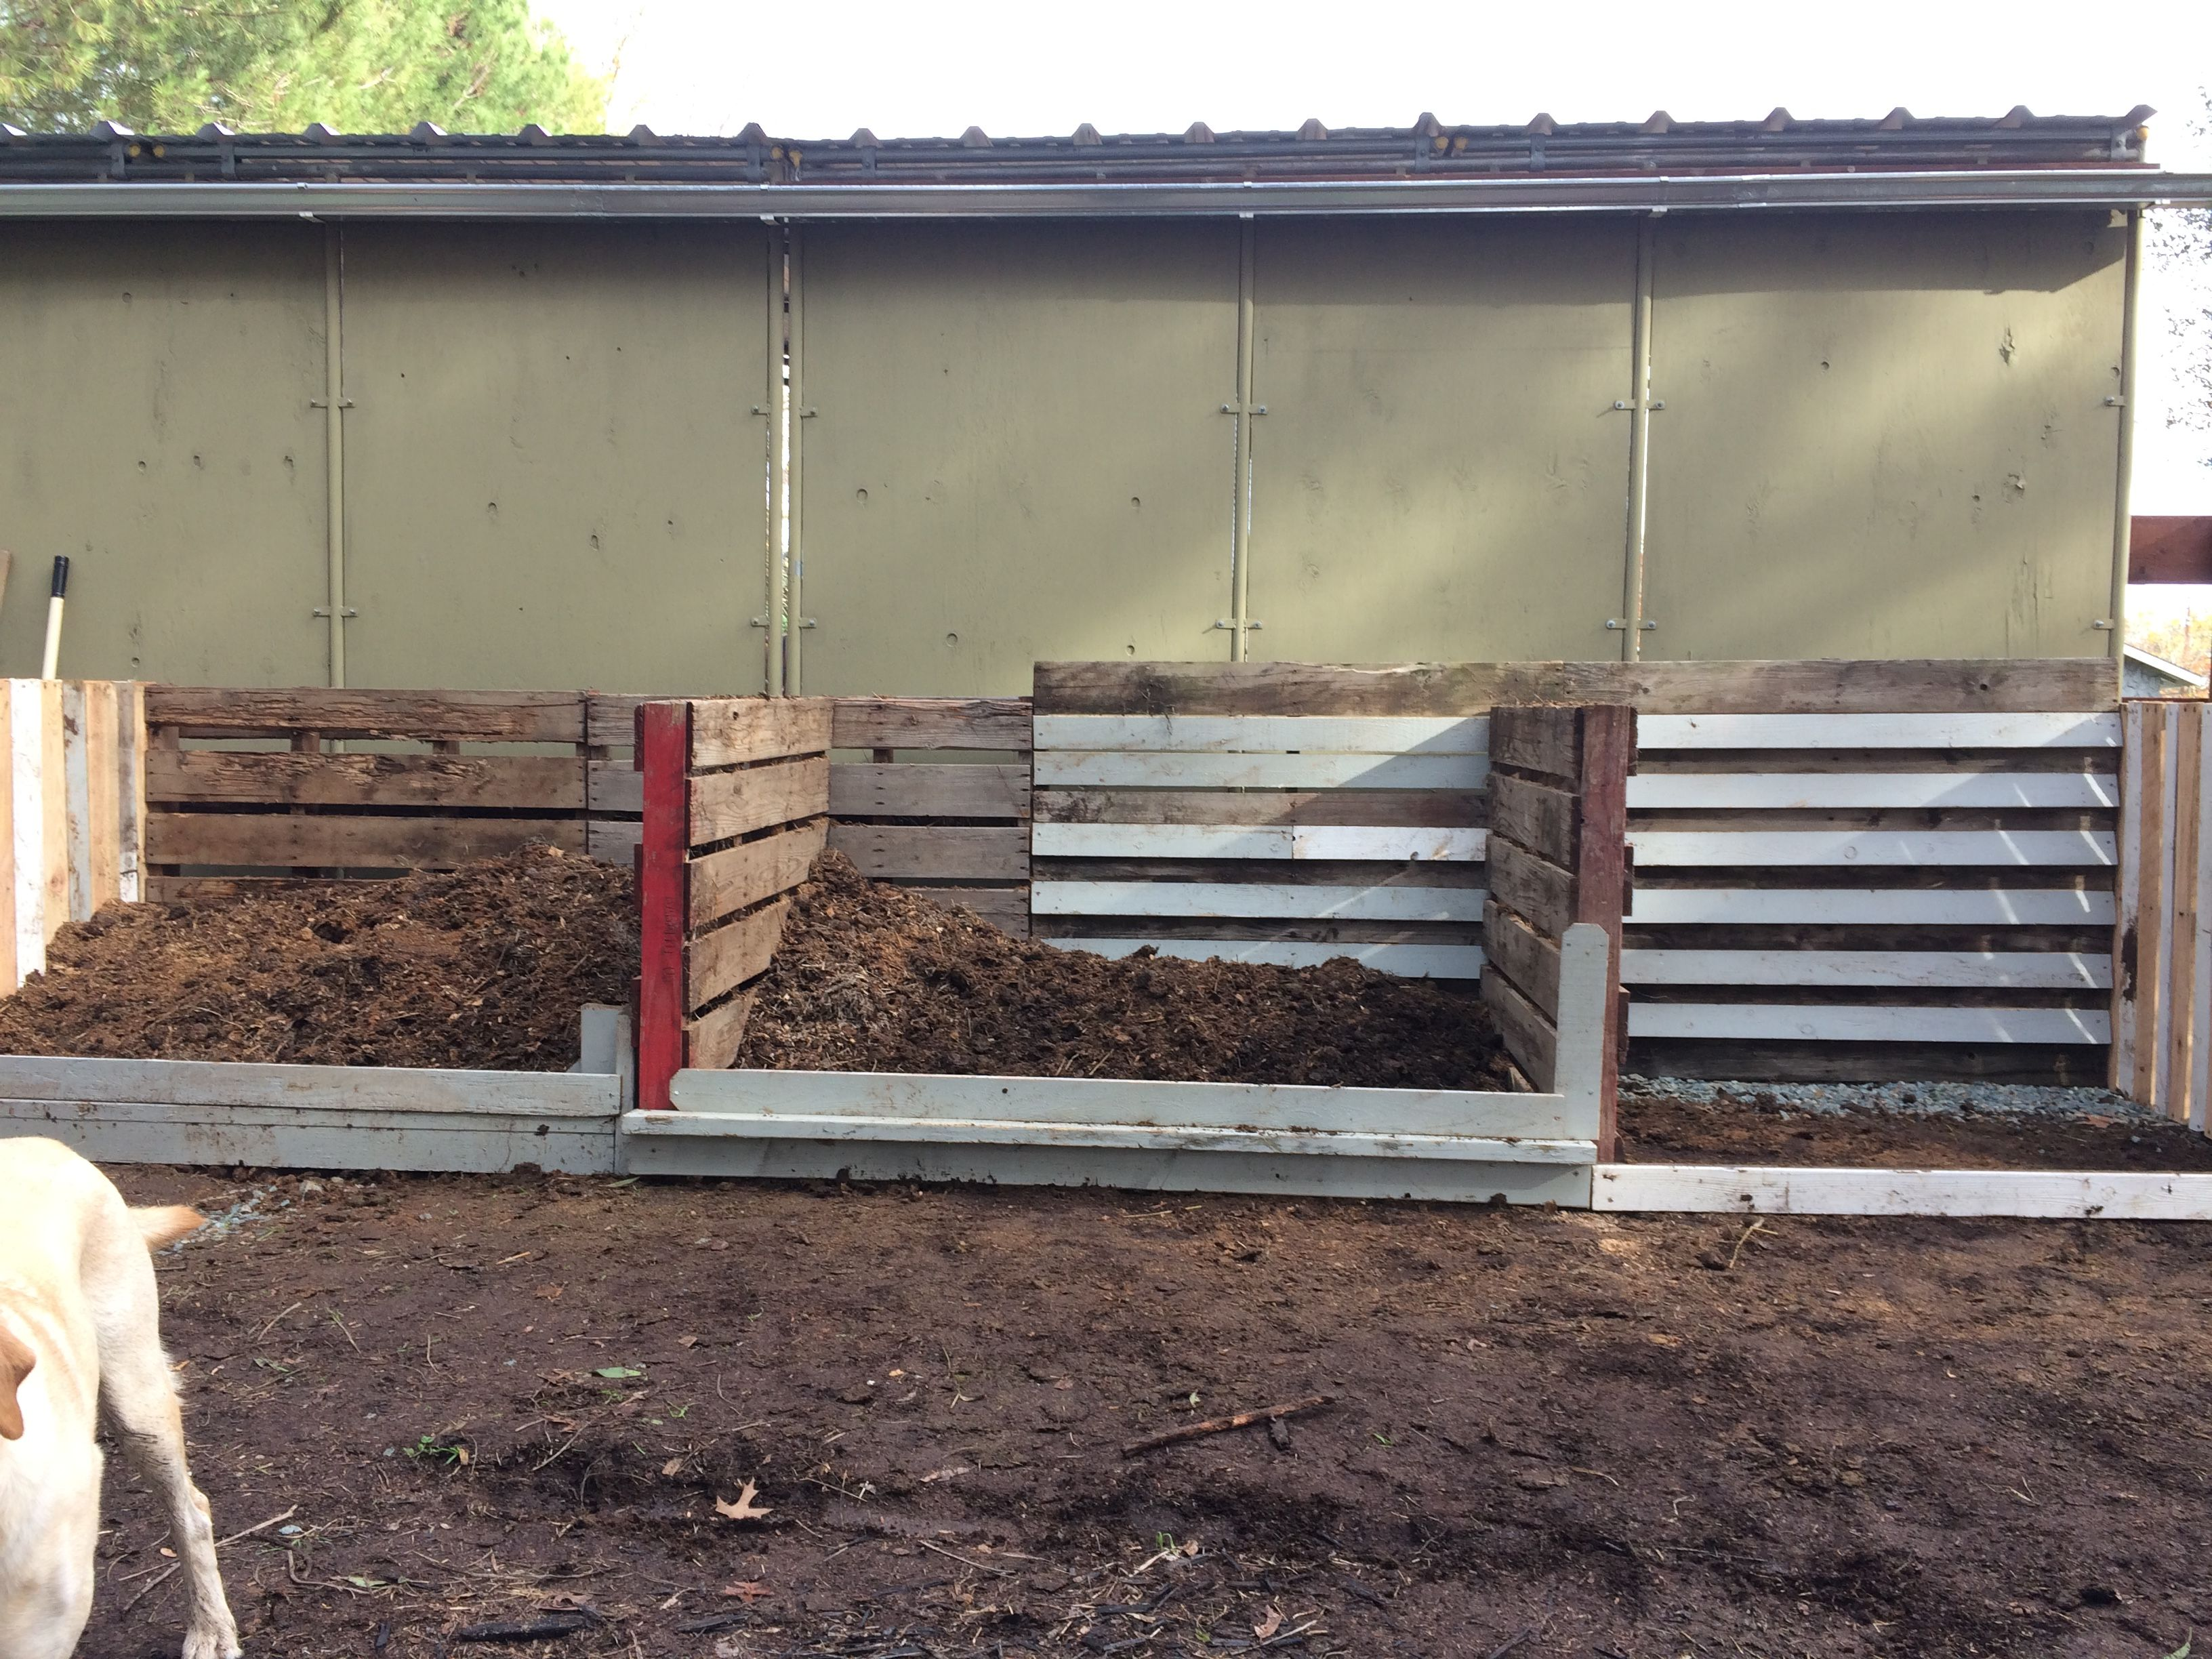 Used Old Pallets To Make Horse Manure Compost Storage DIY Barn